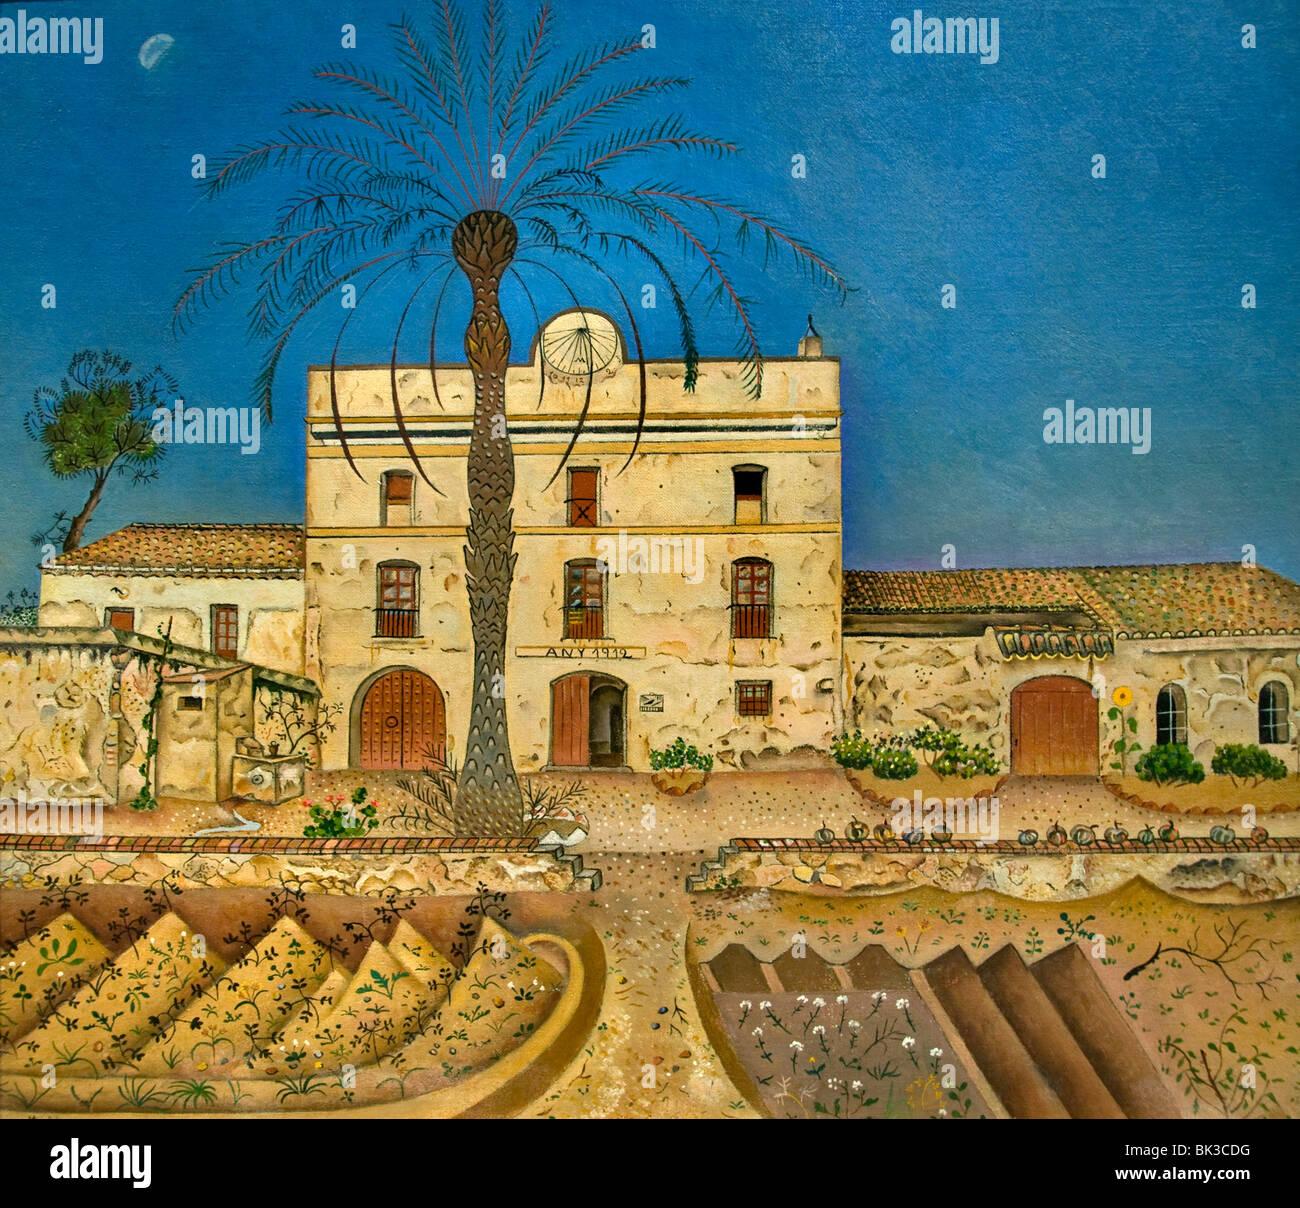 Joan Miri Spain Spanish Painter House with Palm Tree - Stock Image